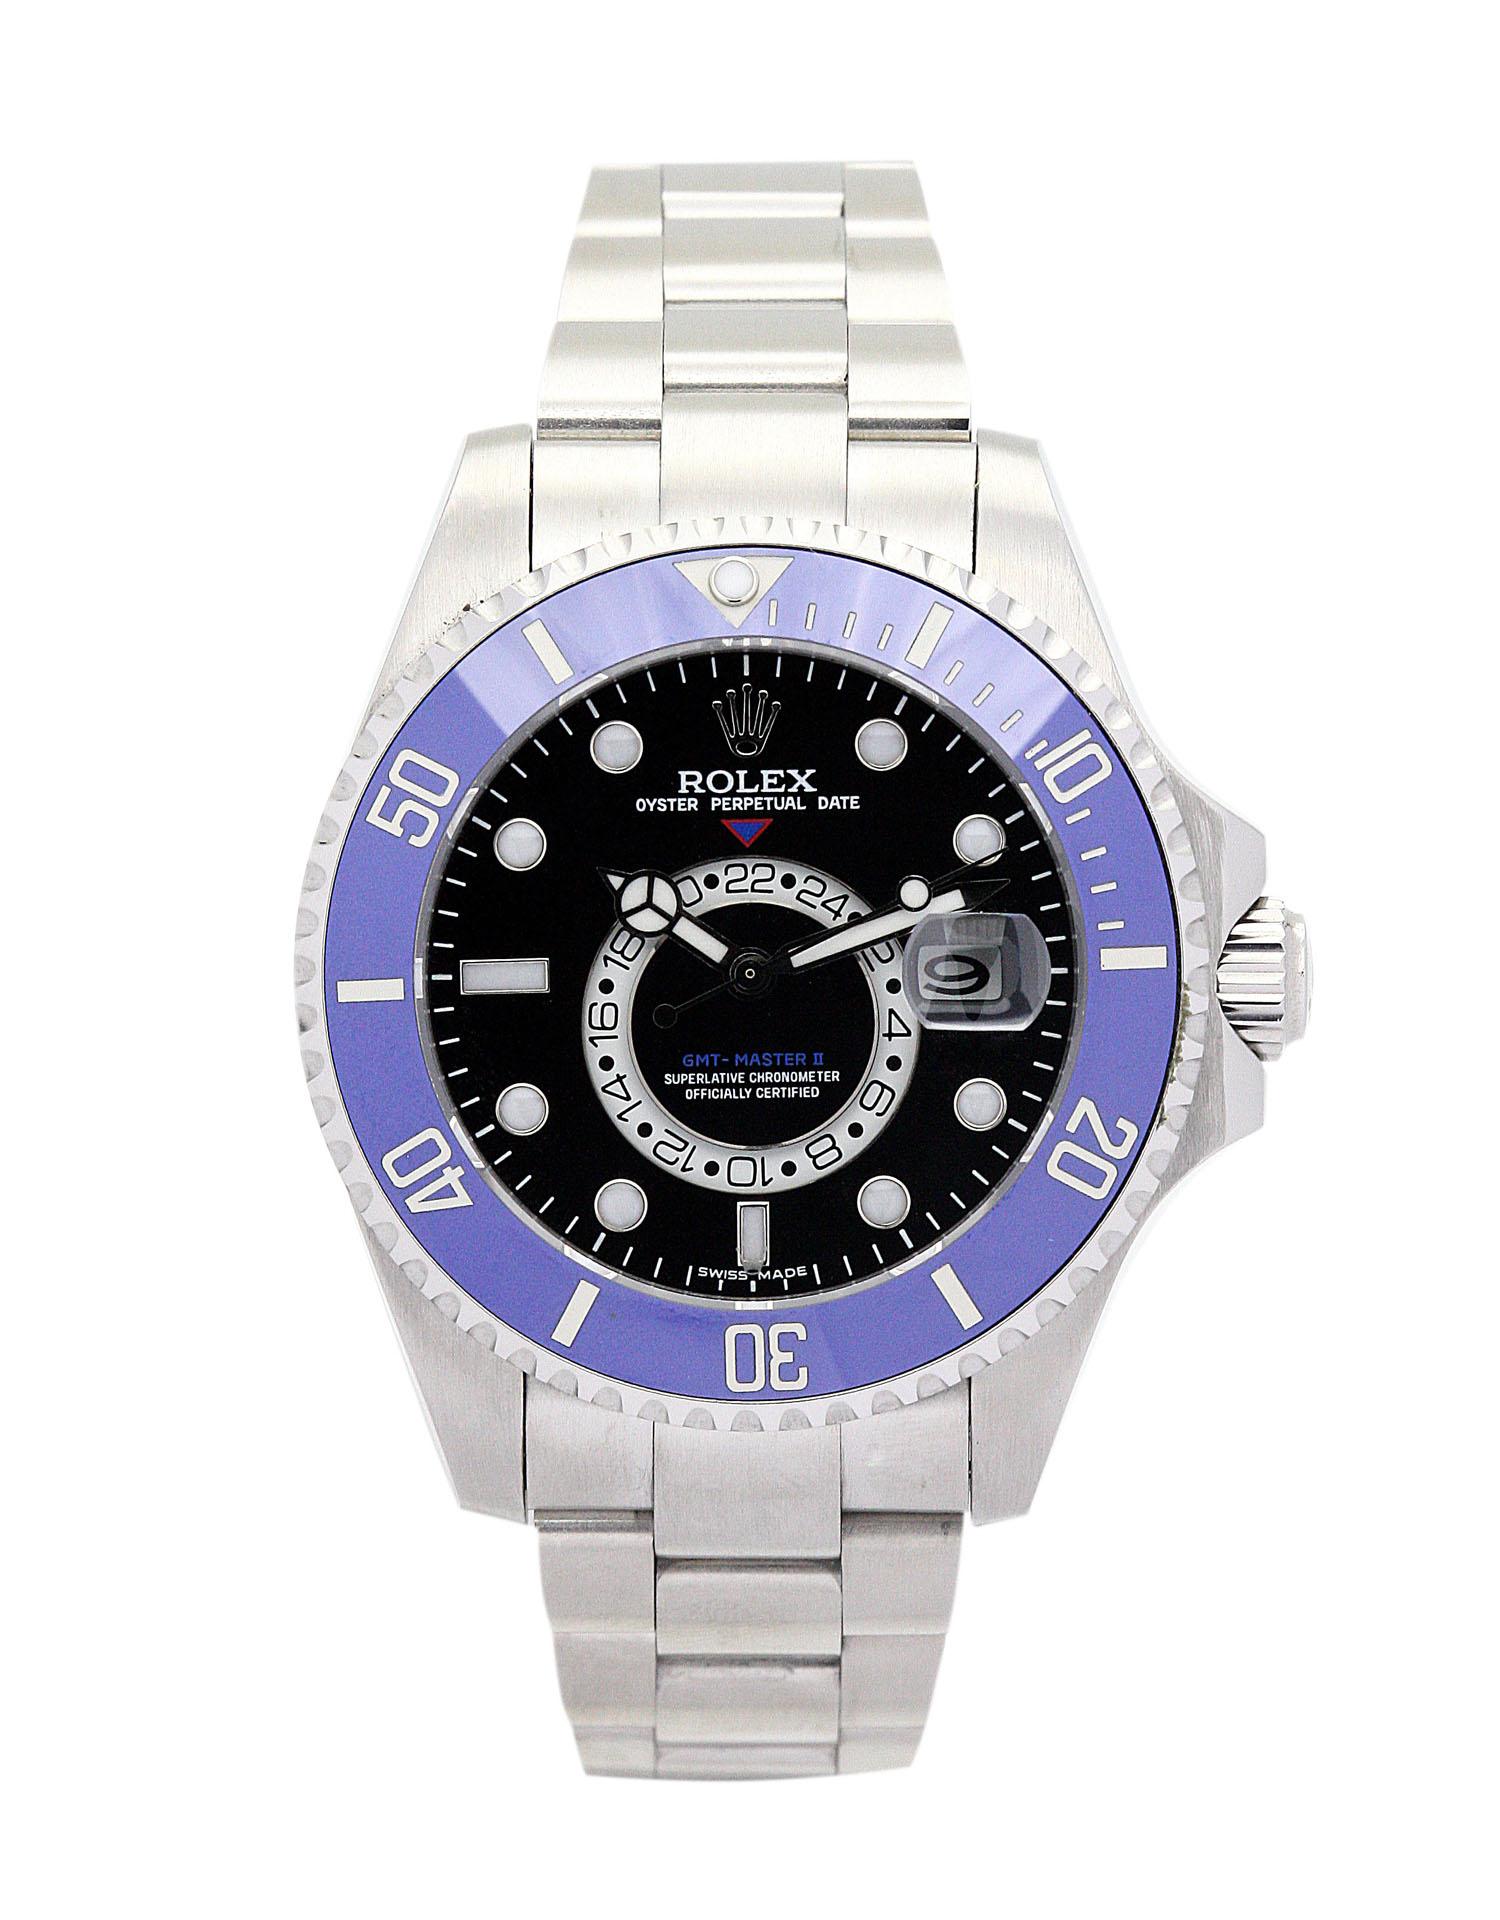 Rolex Gmt Master 16720 Men 40 Blue Steel Case Automatic Movement – iapac.to